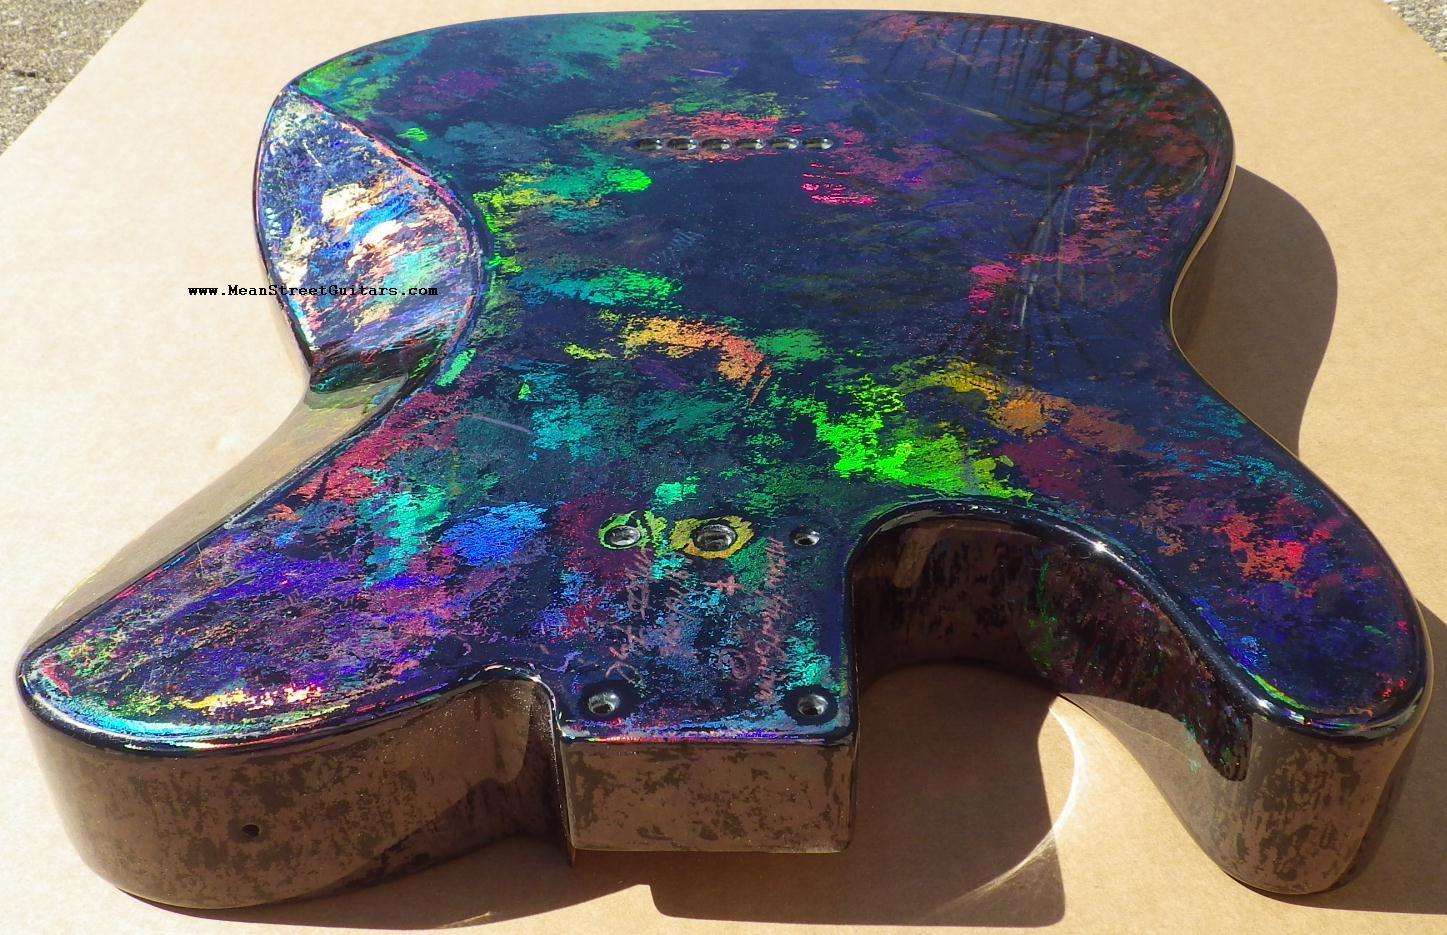 Mean Street Black Fusion Holoflash Telecaster Andrea C pic 11.JPG